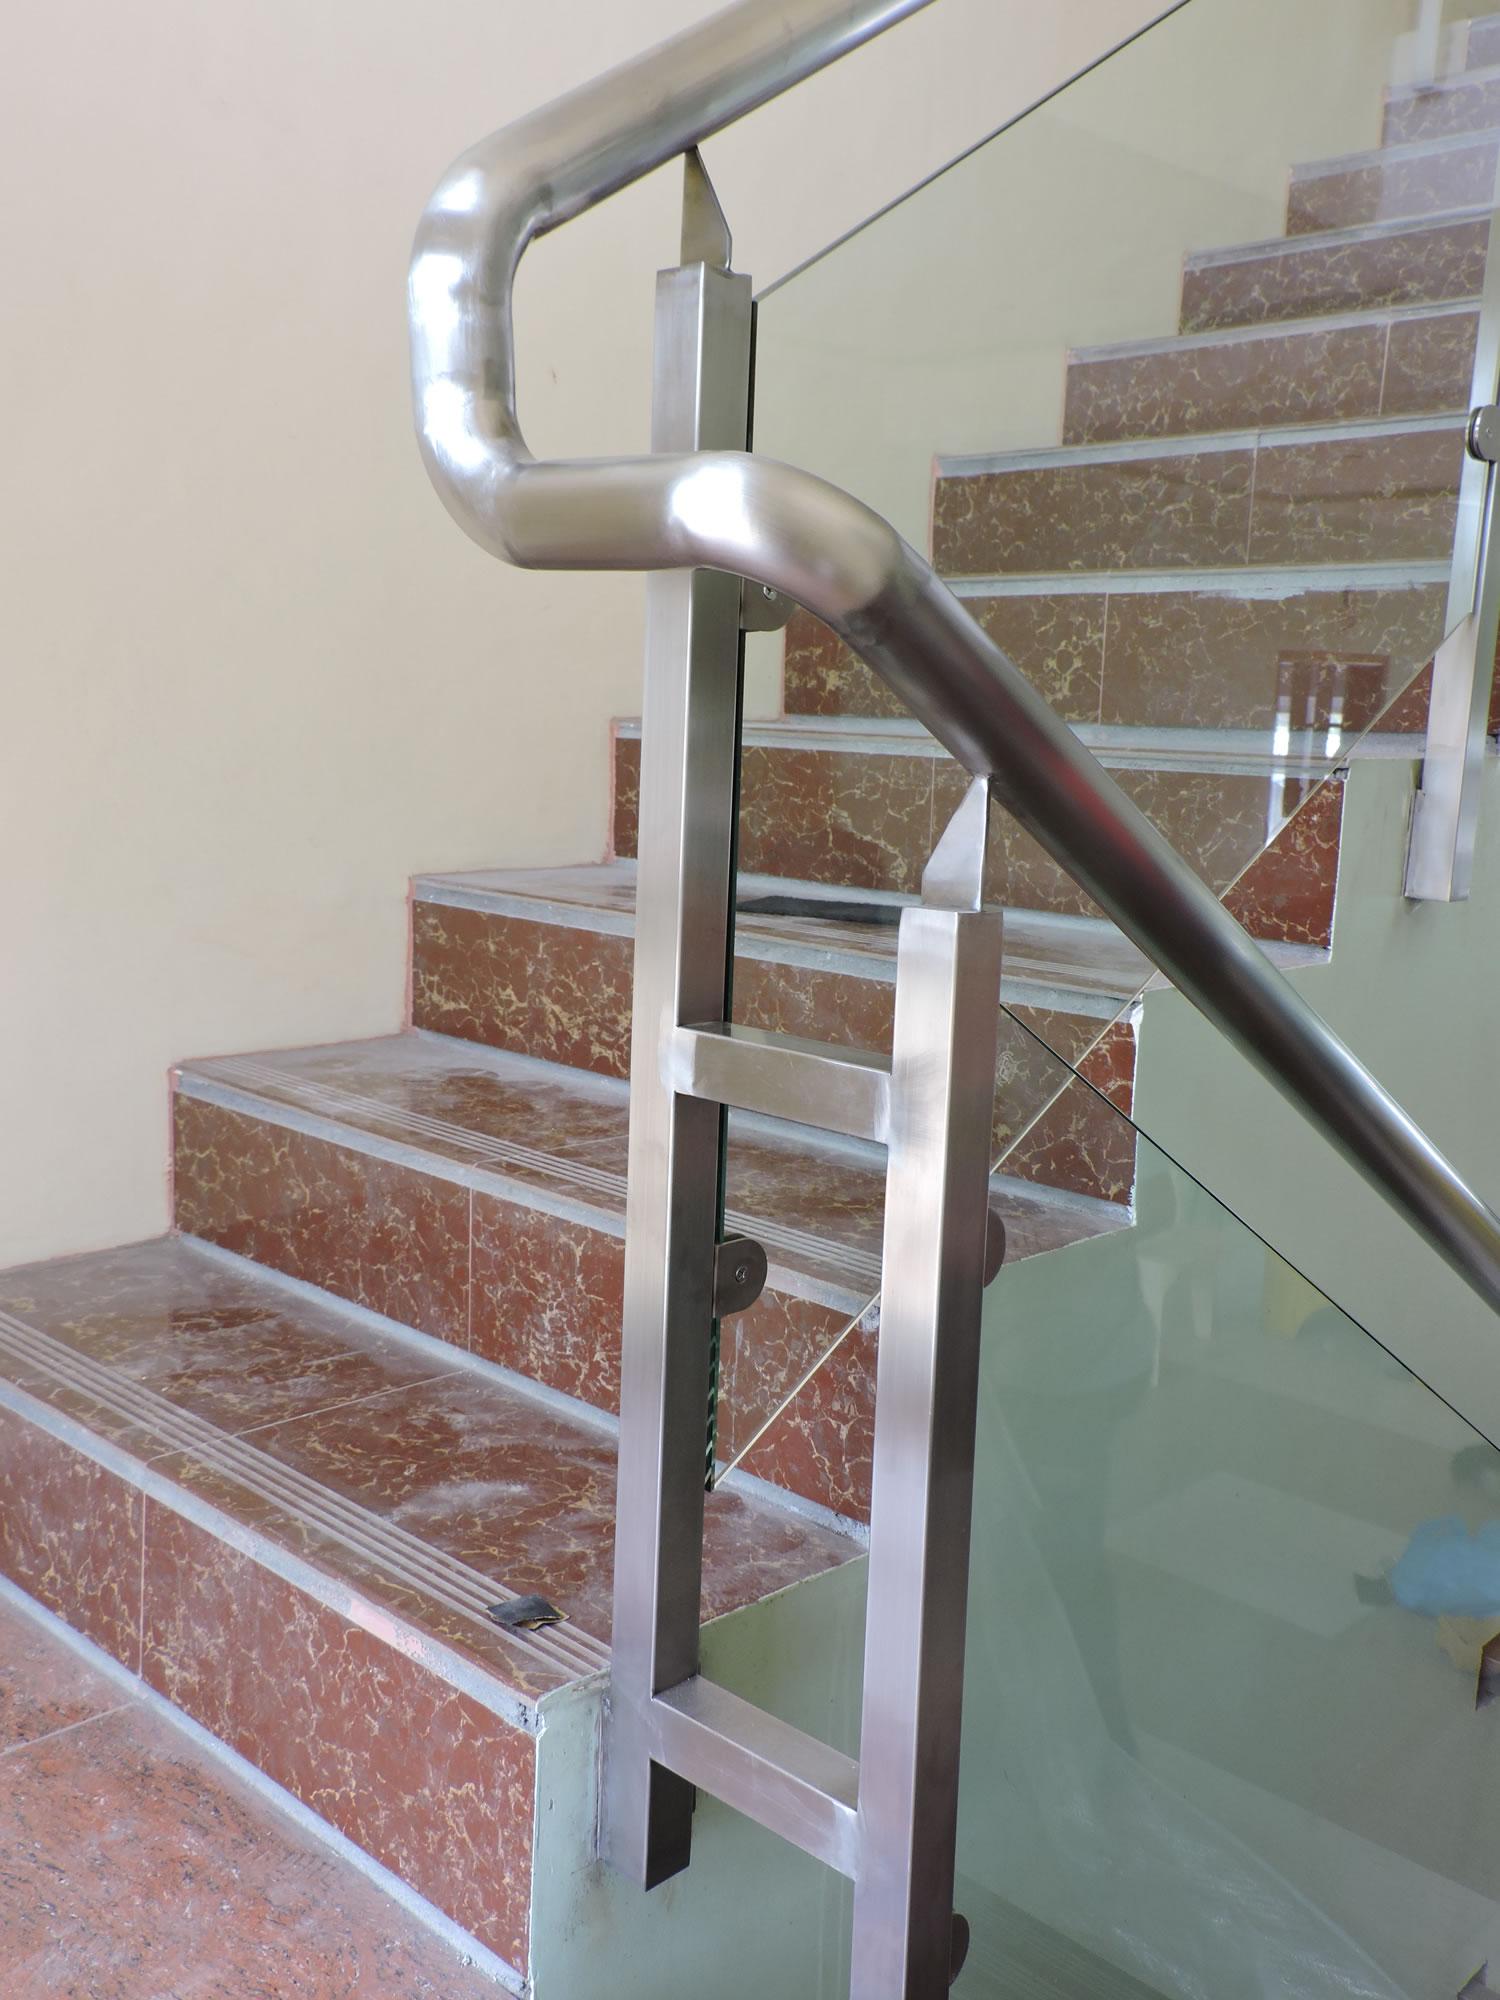 Glass Stair Railing Bicol Albay Philippines